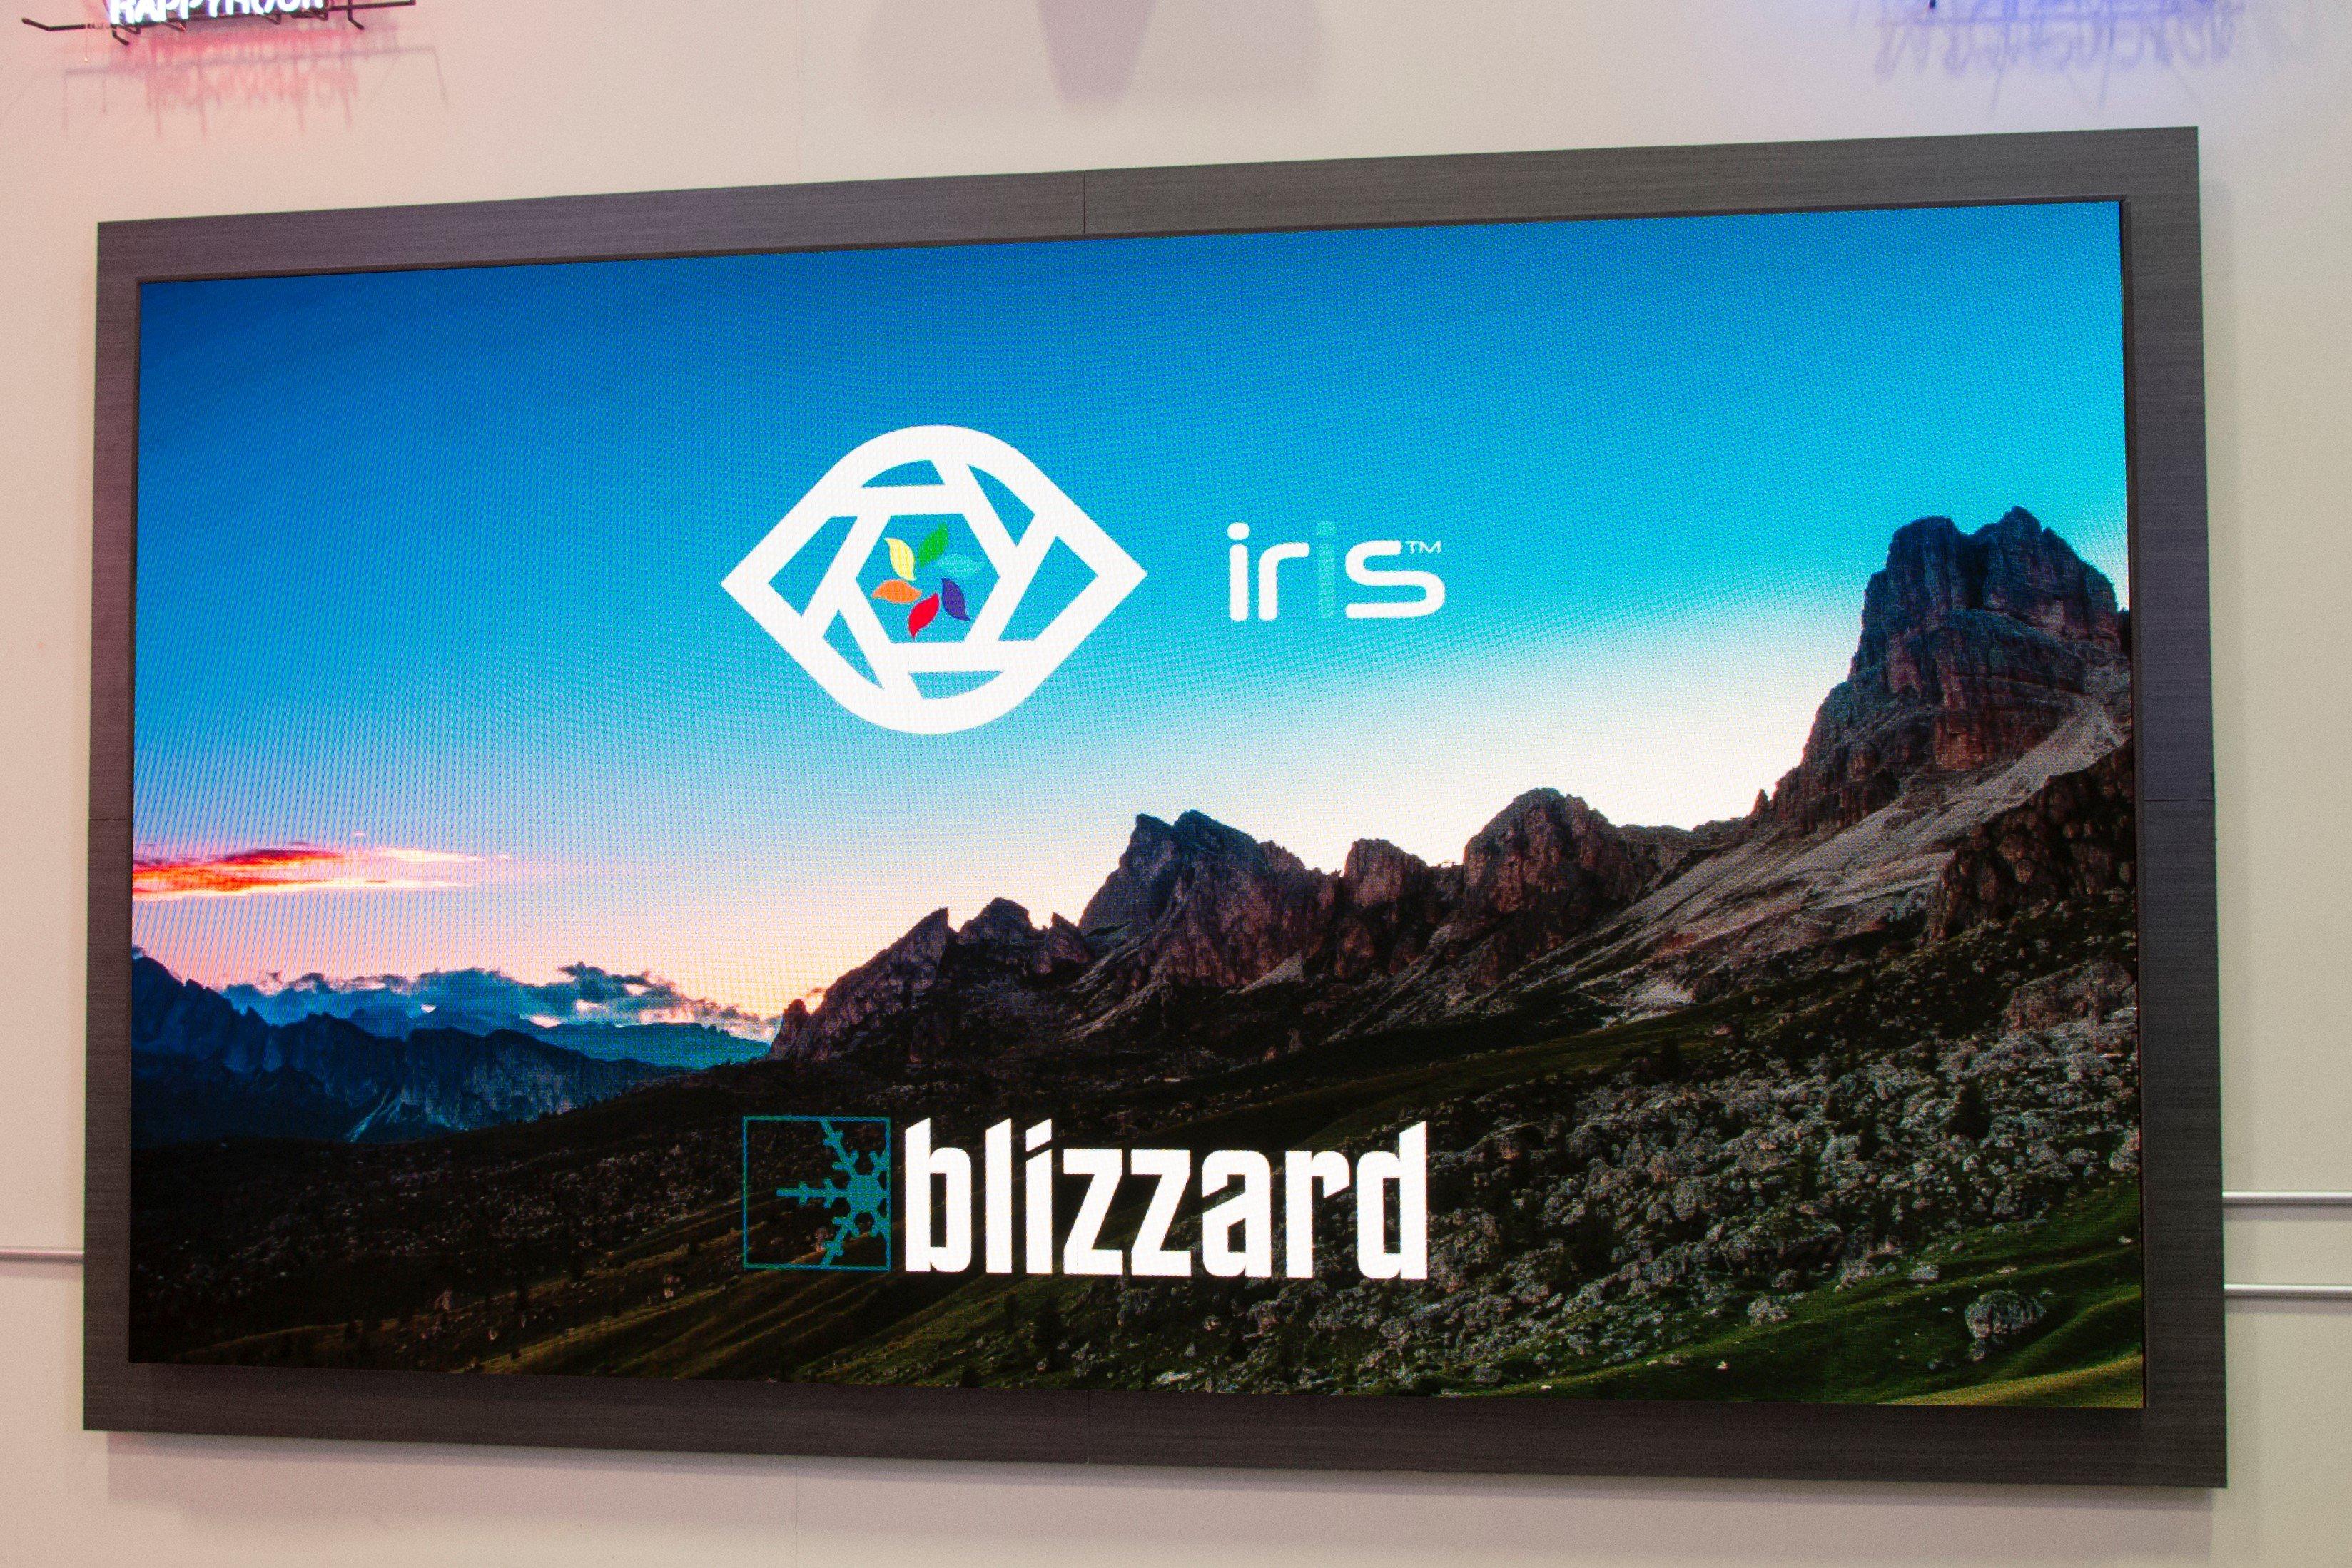 Blizzard_IRiS-InSite-2_5_LED_Video_03